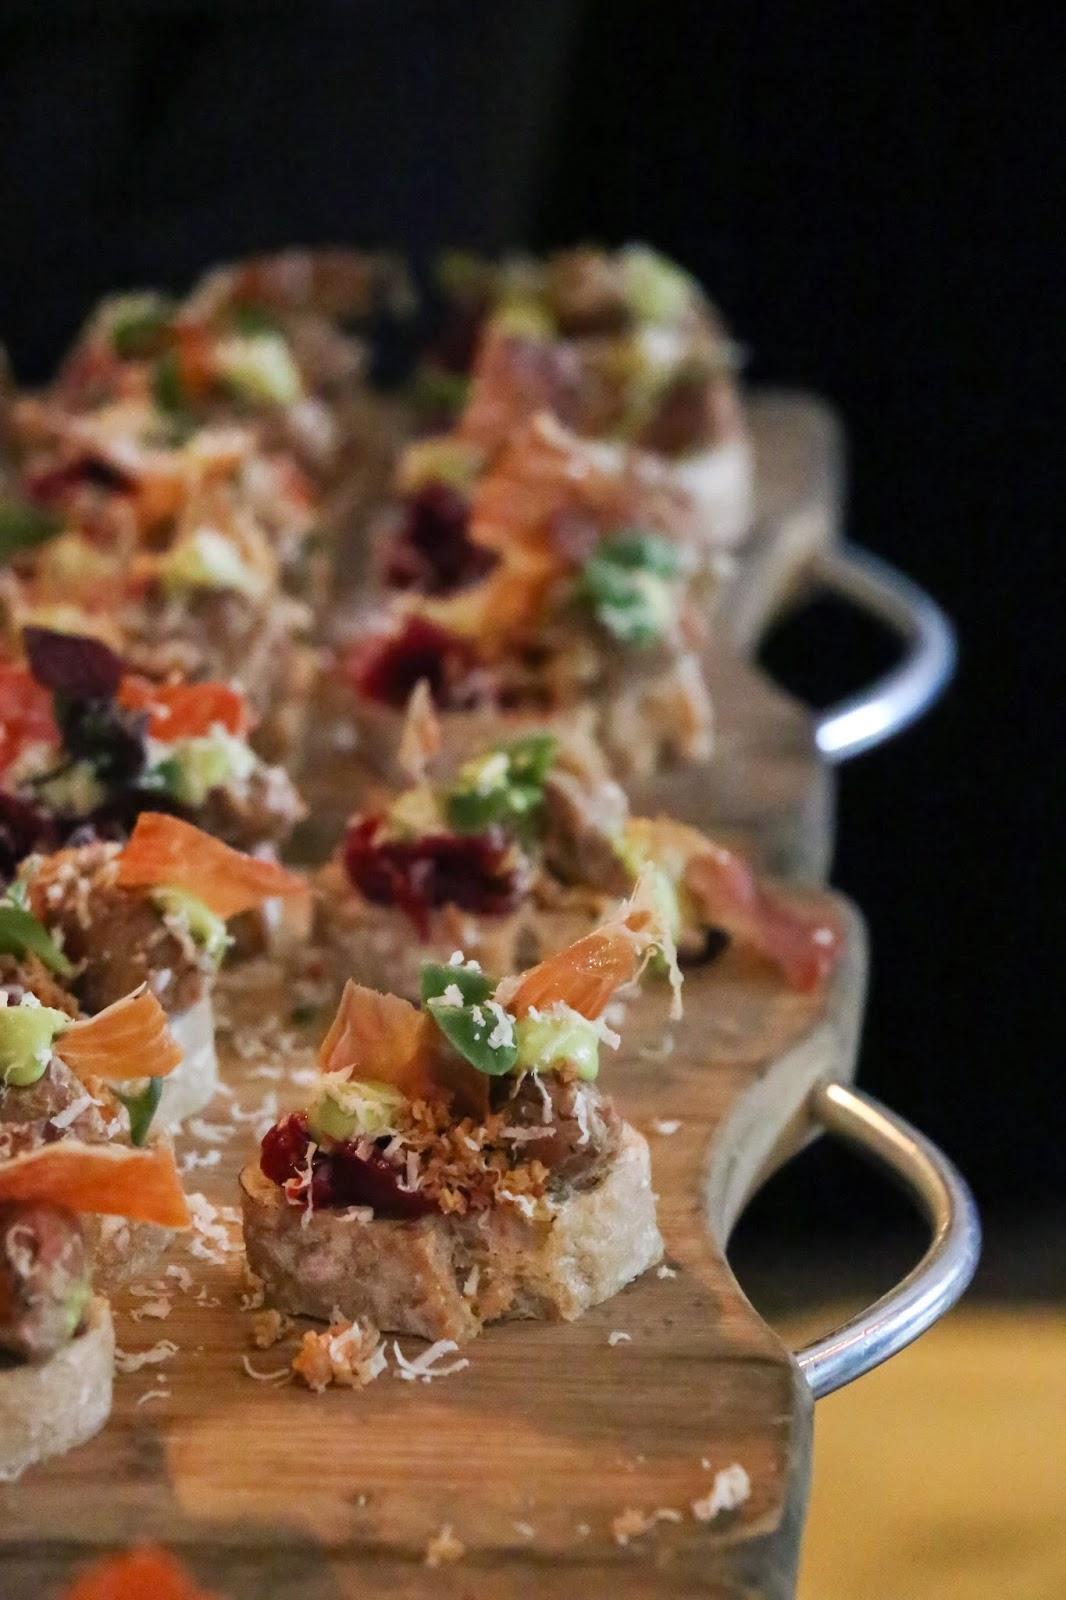 #LKFSavoringArt, Wagyu Beef Tenderloin, Azure Restaurant & Slush Bar